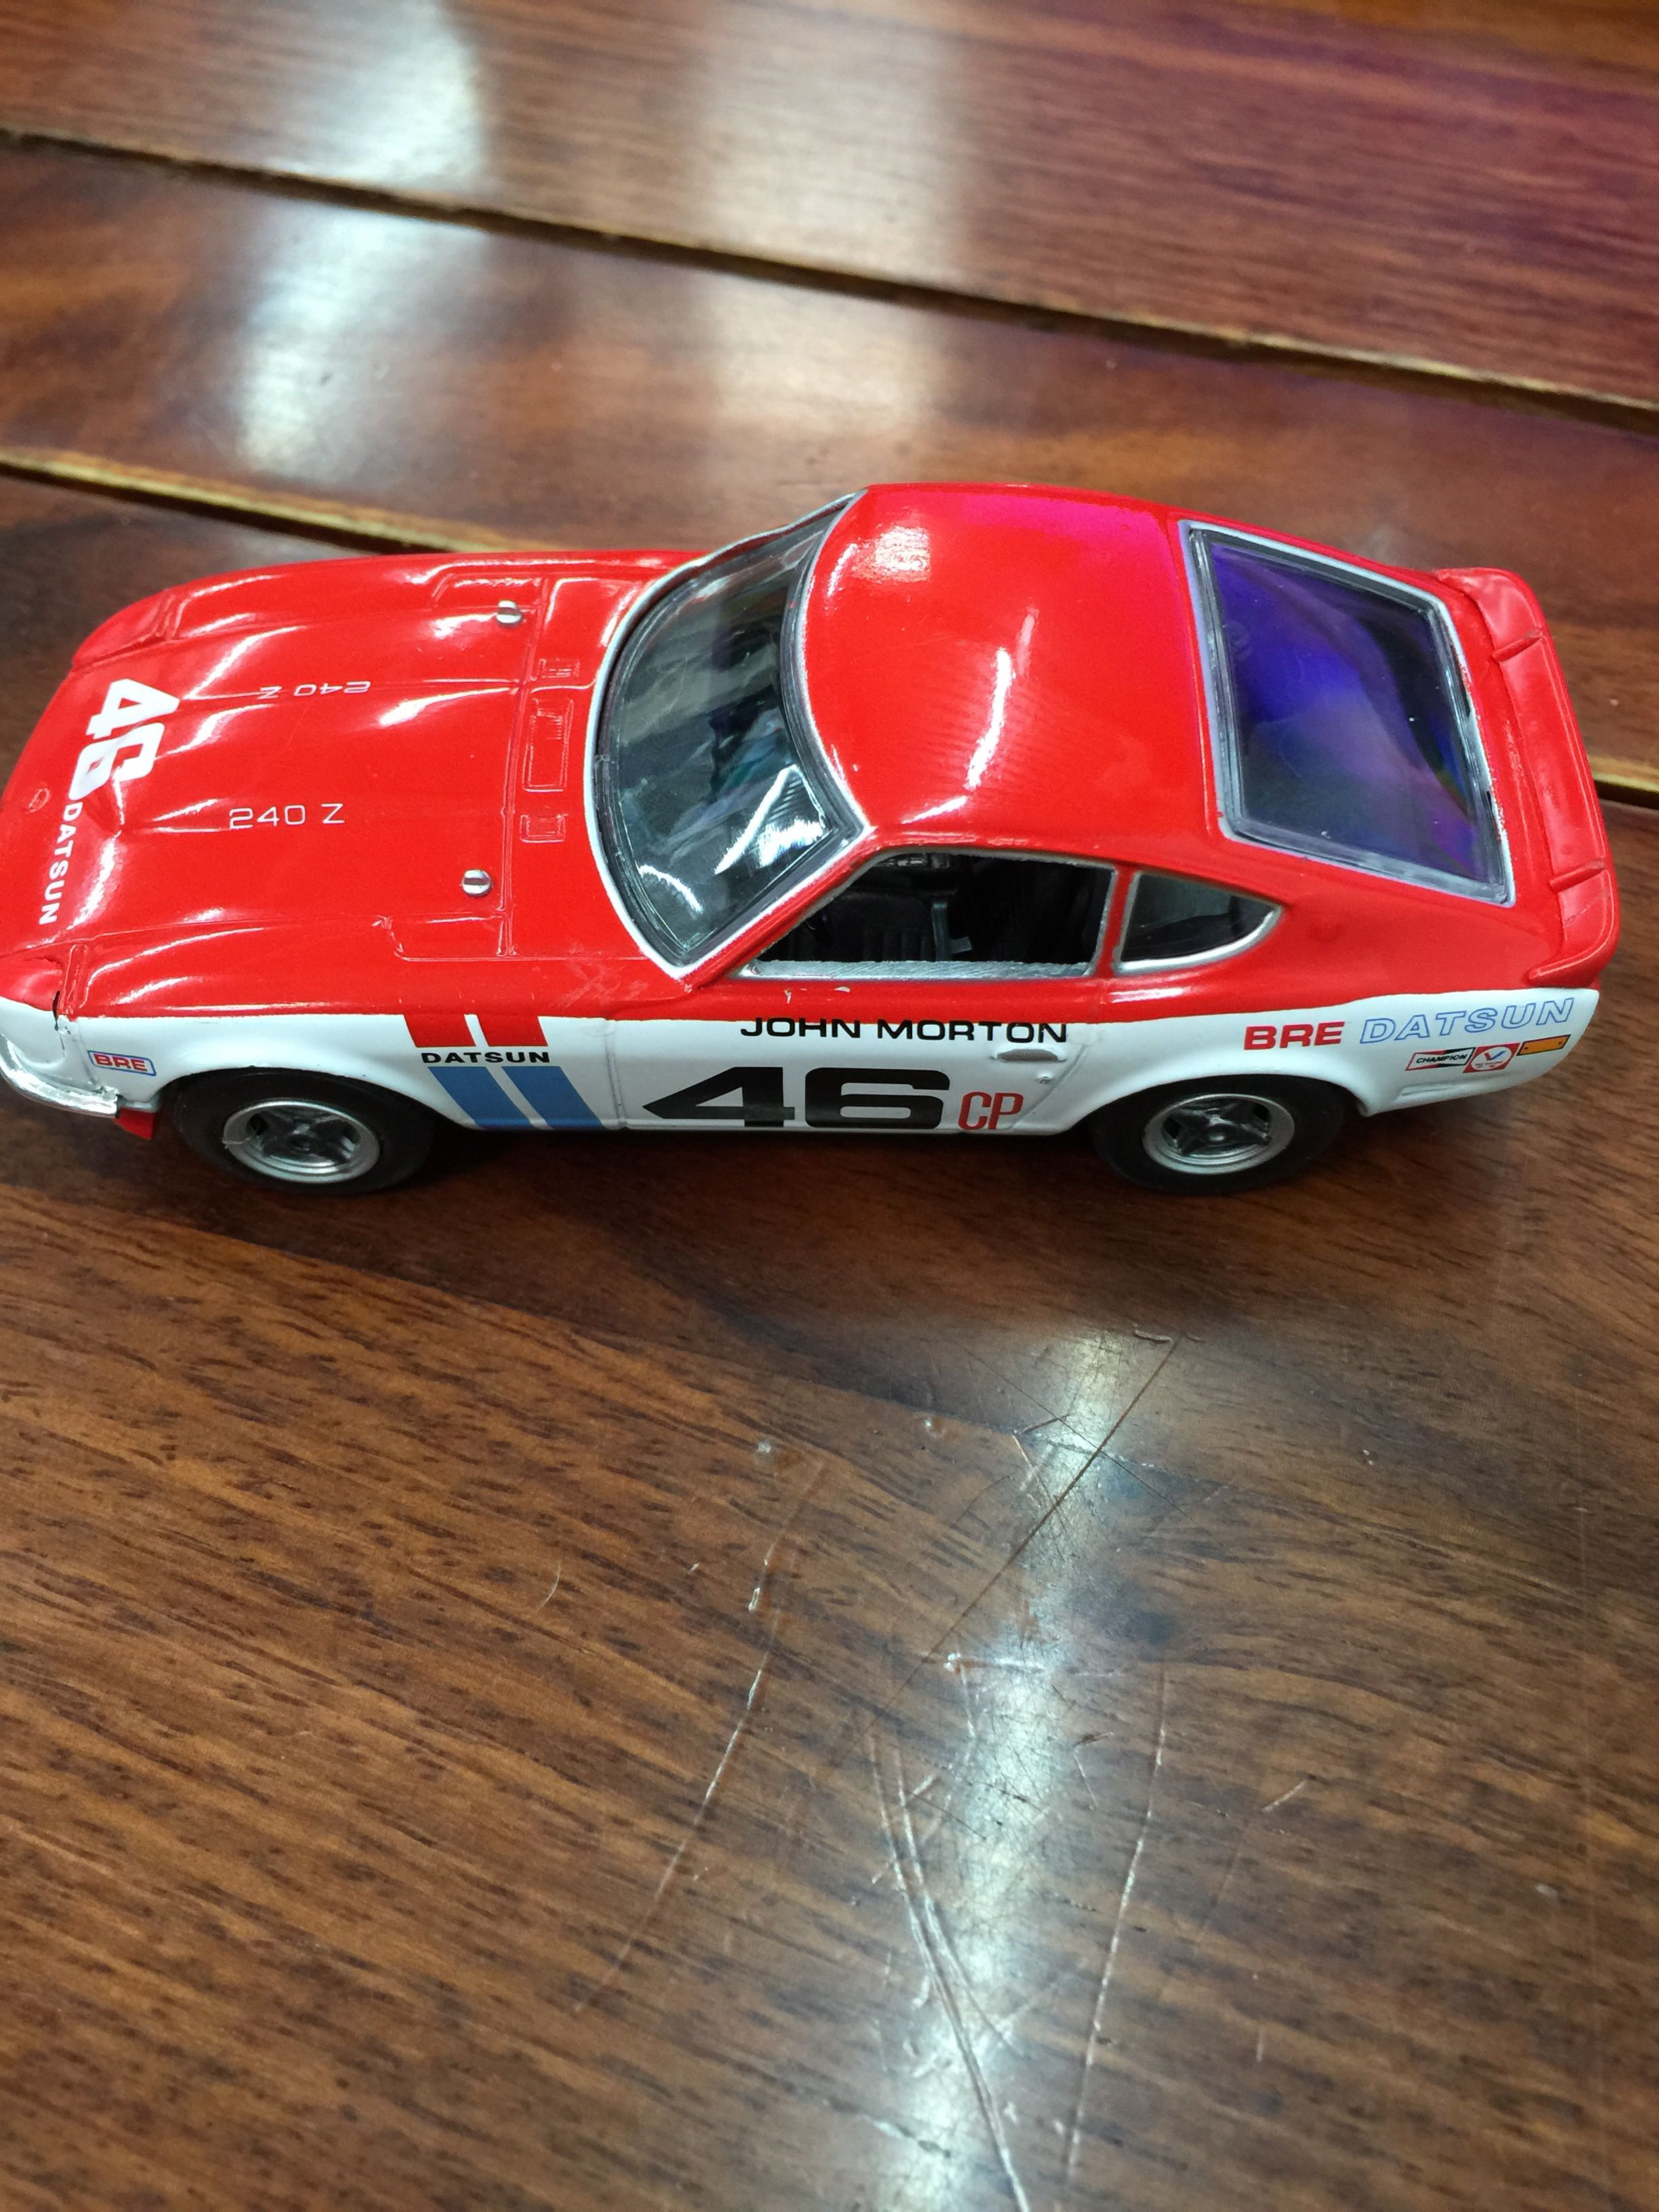 3 teile/los Großhandel Delprado 1/43 Skala Rennwagen Spielzeug 1970 BRE DATSUNS 240Z JOHN MORTON Diecast Metall Auto-modell Spielzeug